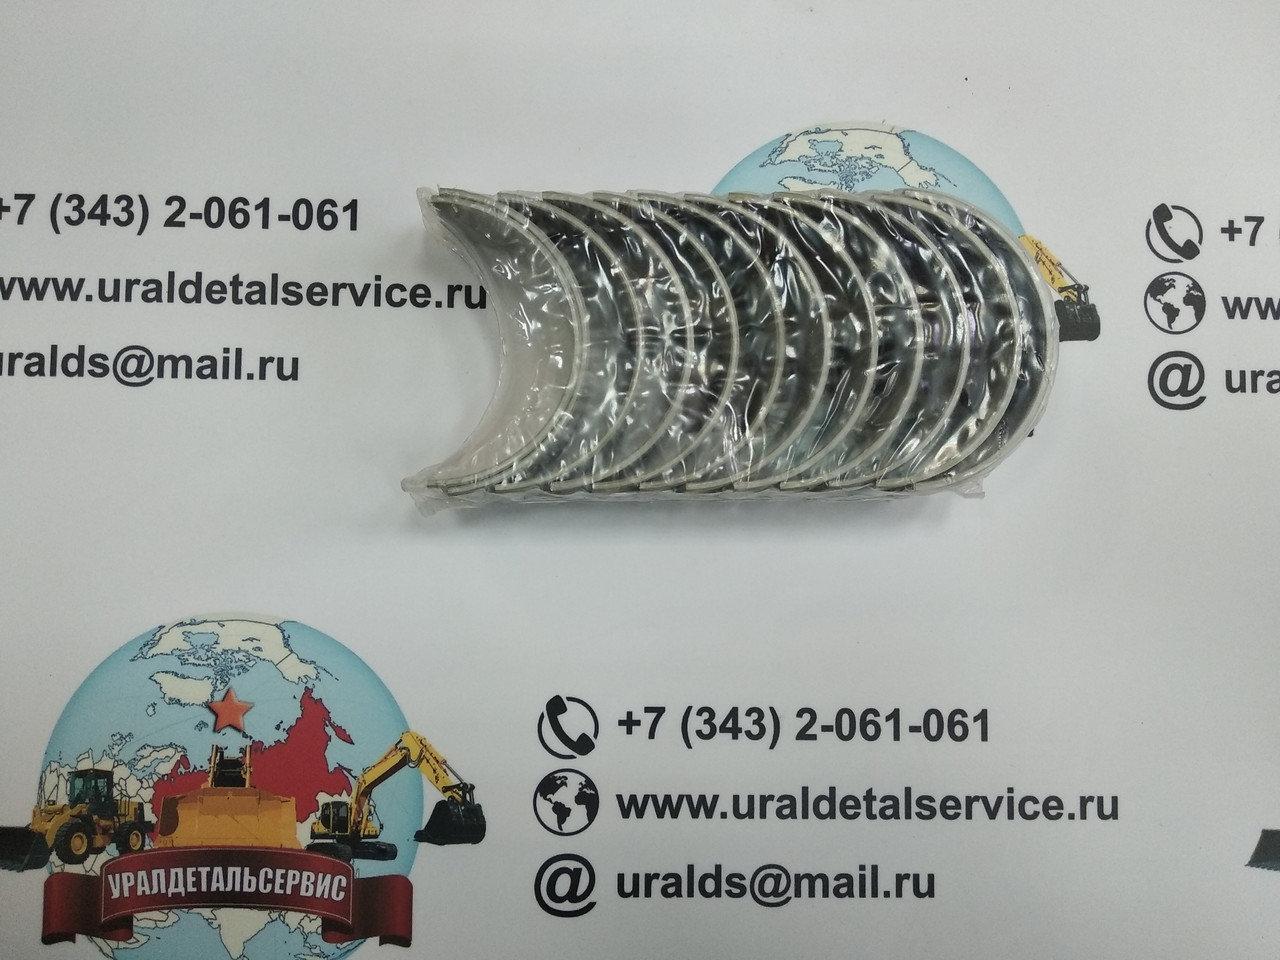 6BG1-Isuzu-9122716080-shatunnye-5122710100